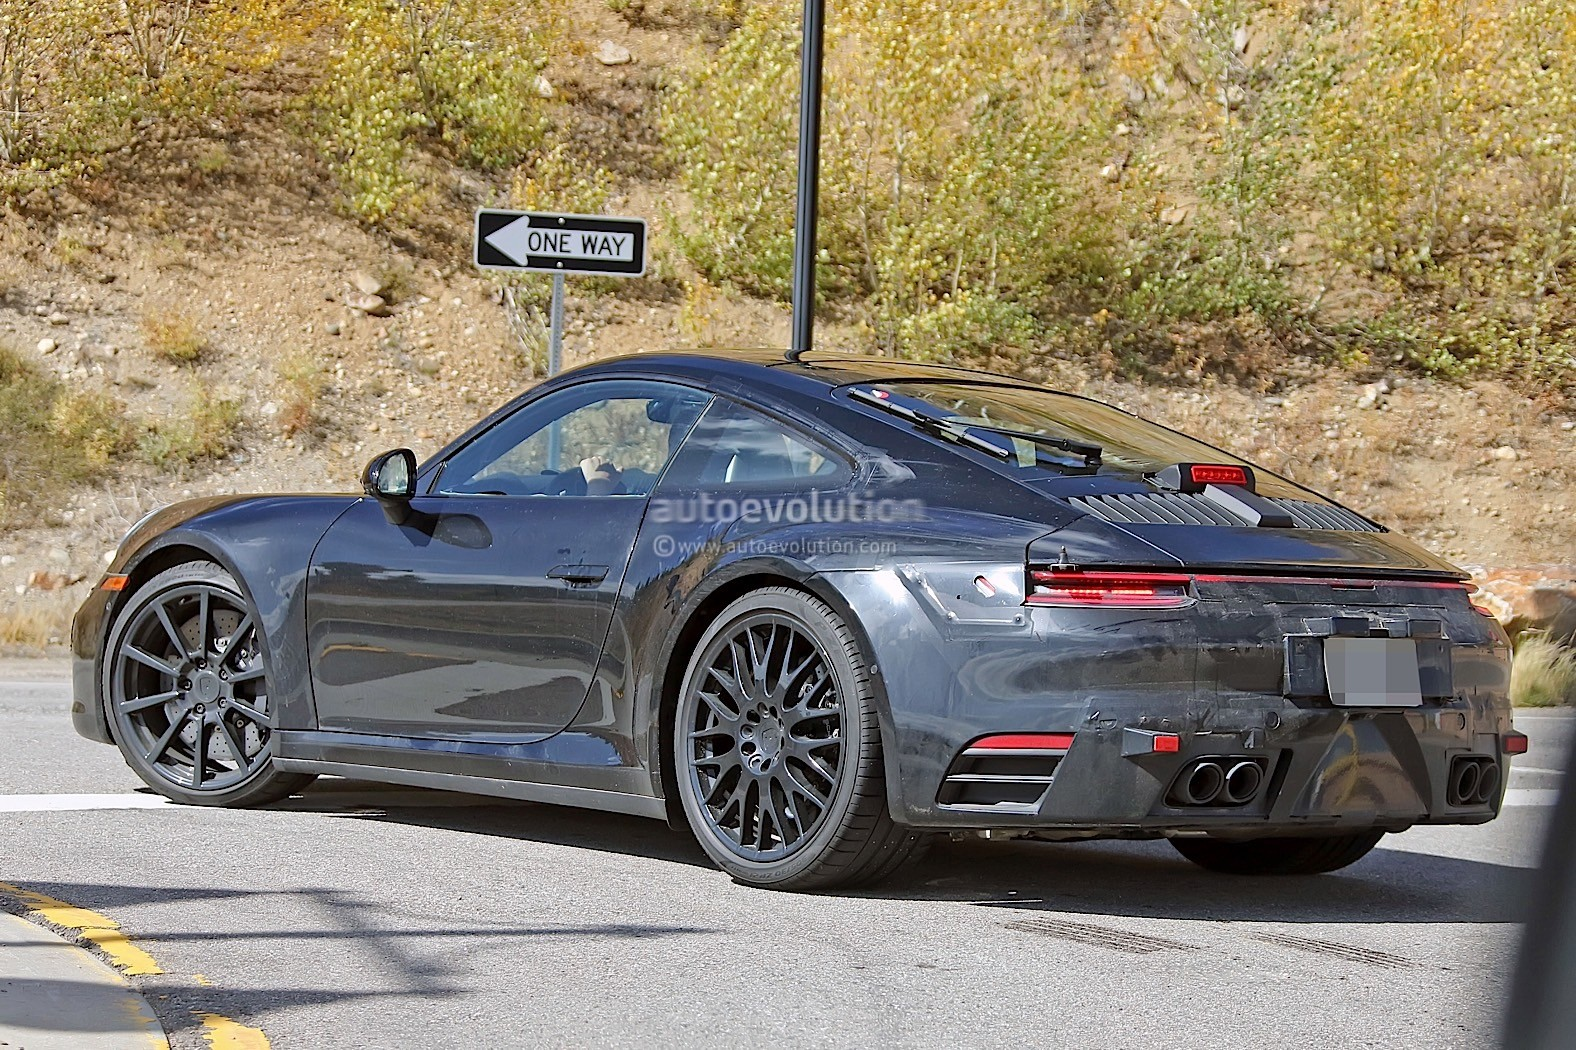 Spyshots Porsche Reveals Digital Dashboard With Analog Rev Counter in addition Nissan Armada Interior additionally Hyundai Tucson Crossover Suv besides Honda Odyssey furthermore Audi Q Facelift. on 2017 porsche cayenne release date